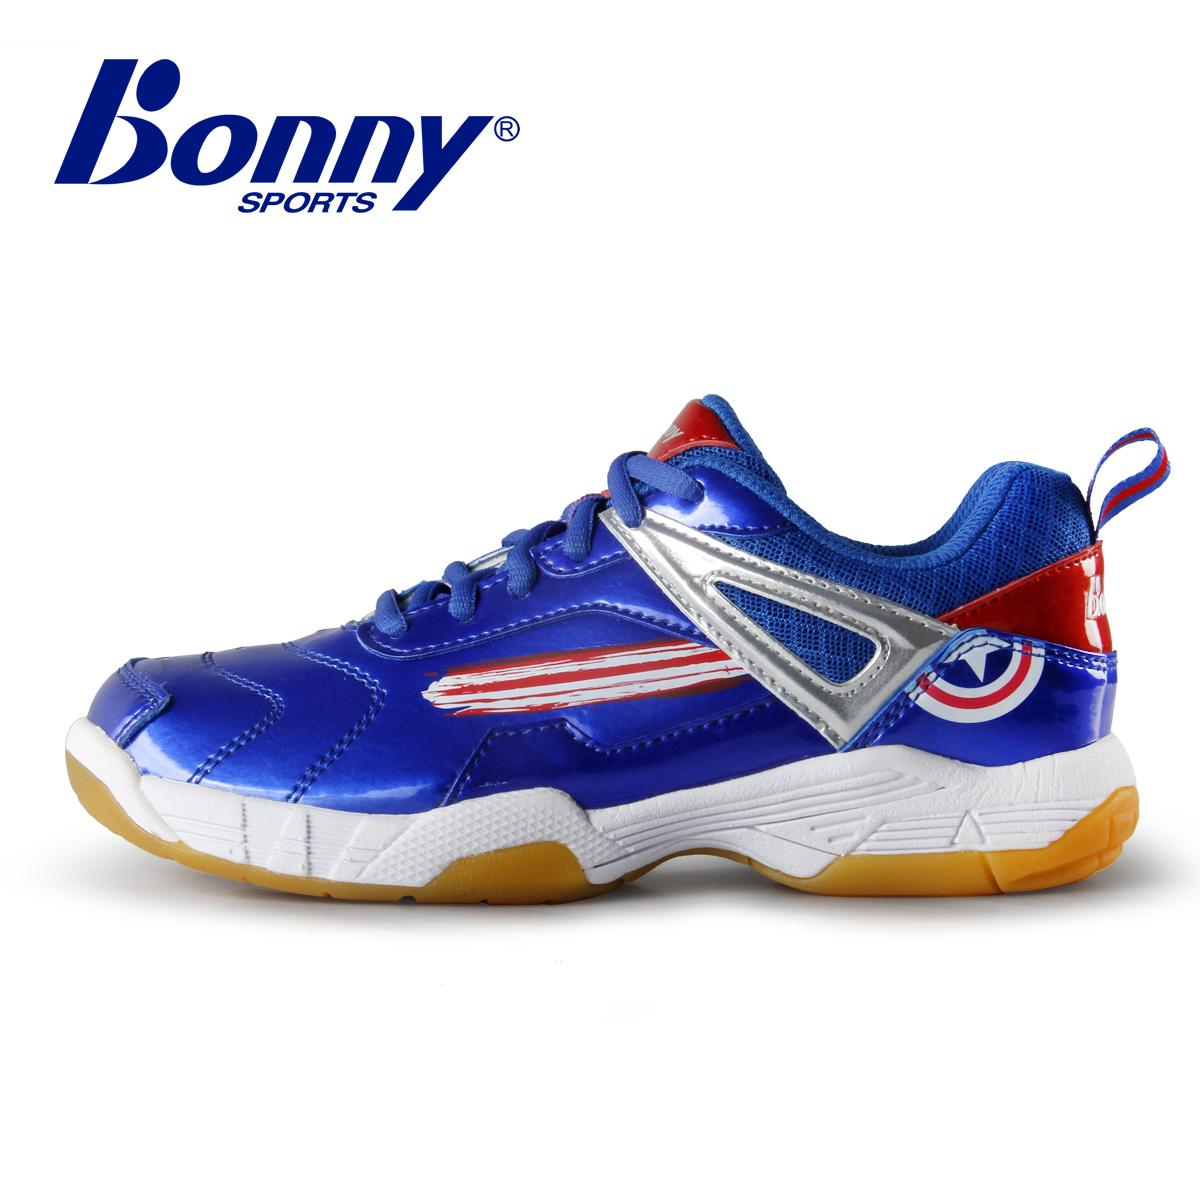 bonny波力专业透气减震儿童羽毛球鞋运动鞋男童女童小学生羽球鞋